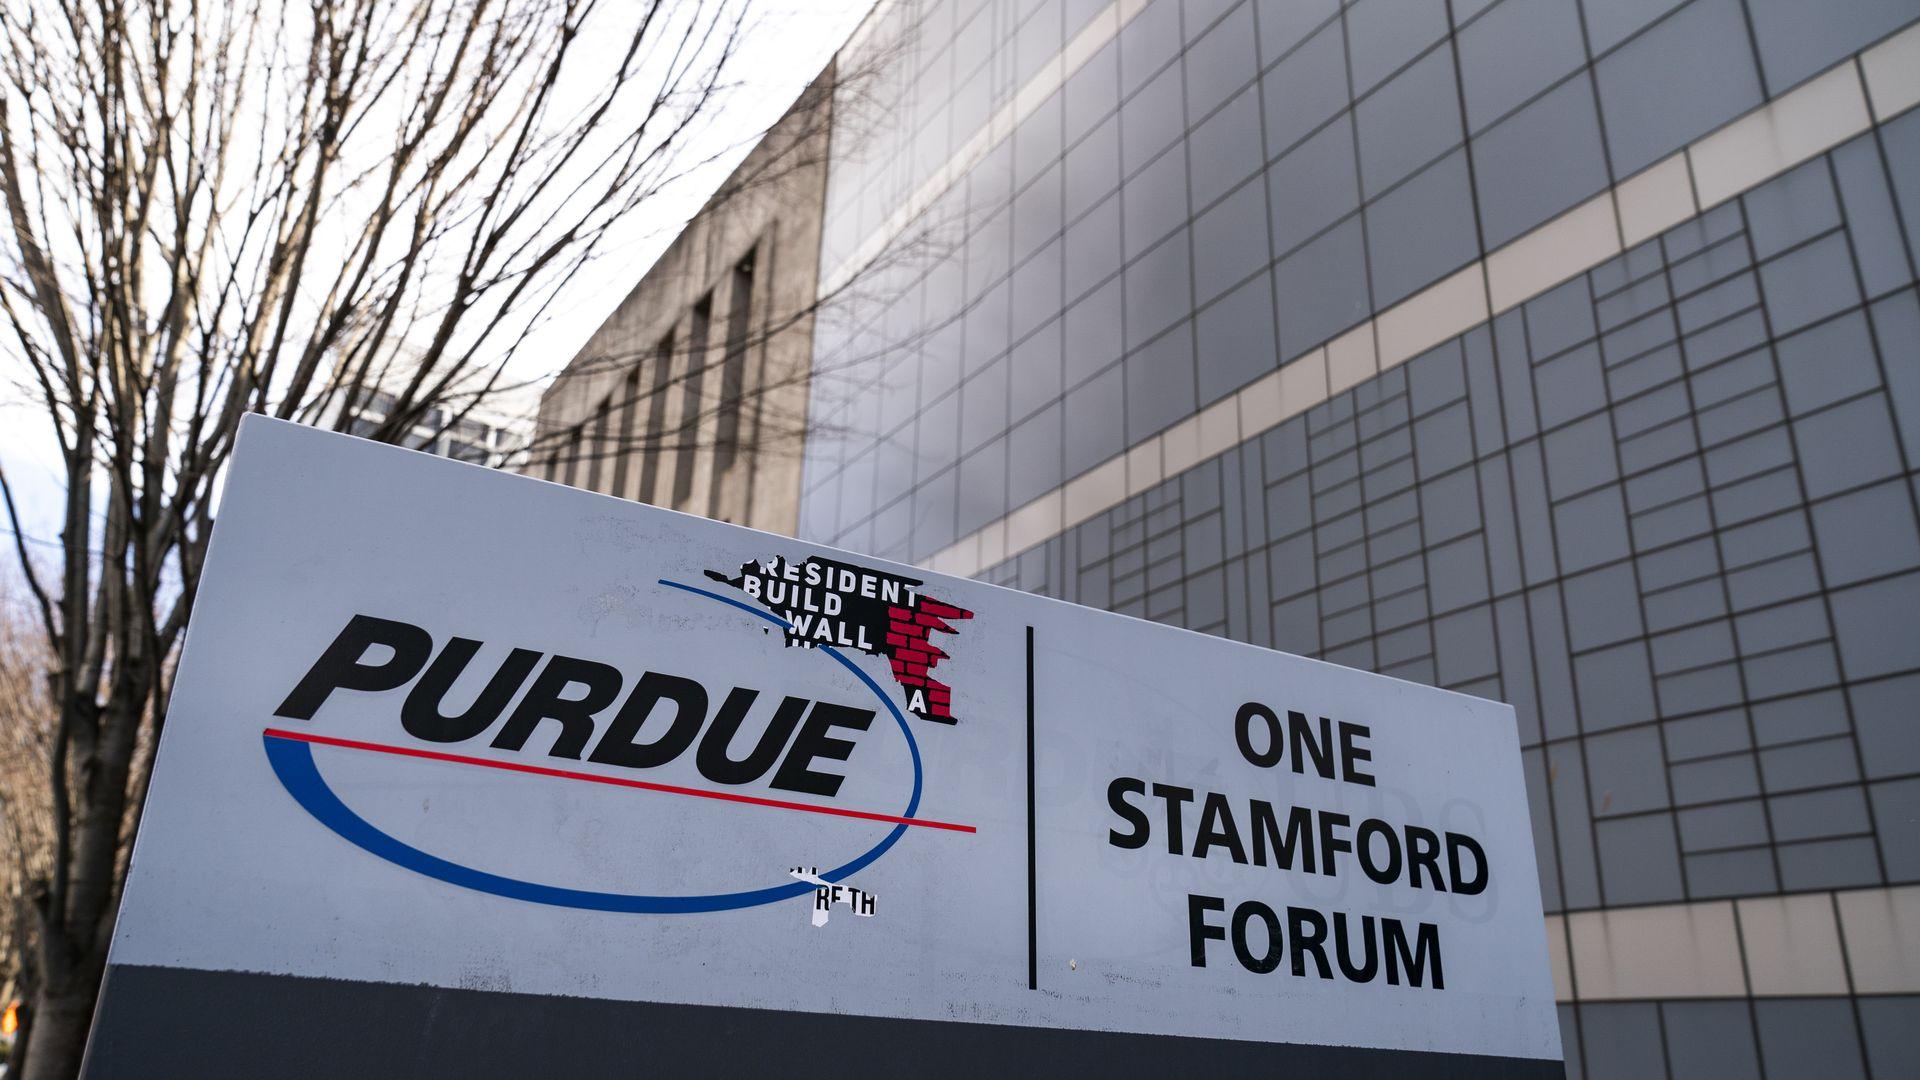 Purdue Pharma headquarters in Stamford, Connecticut